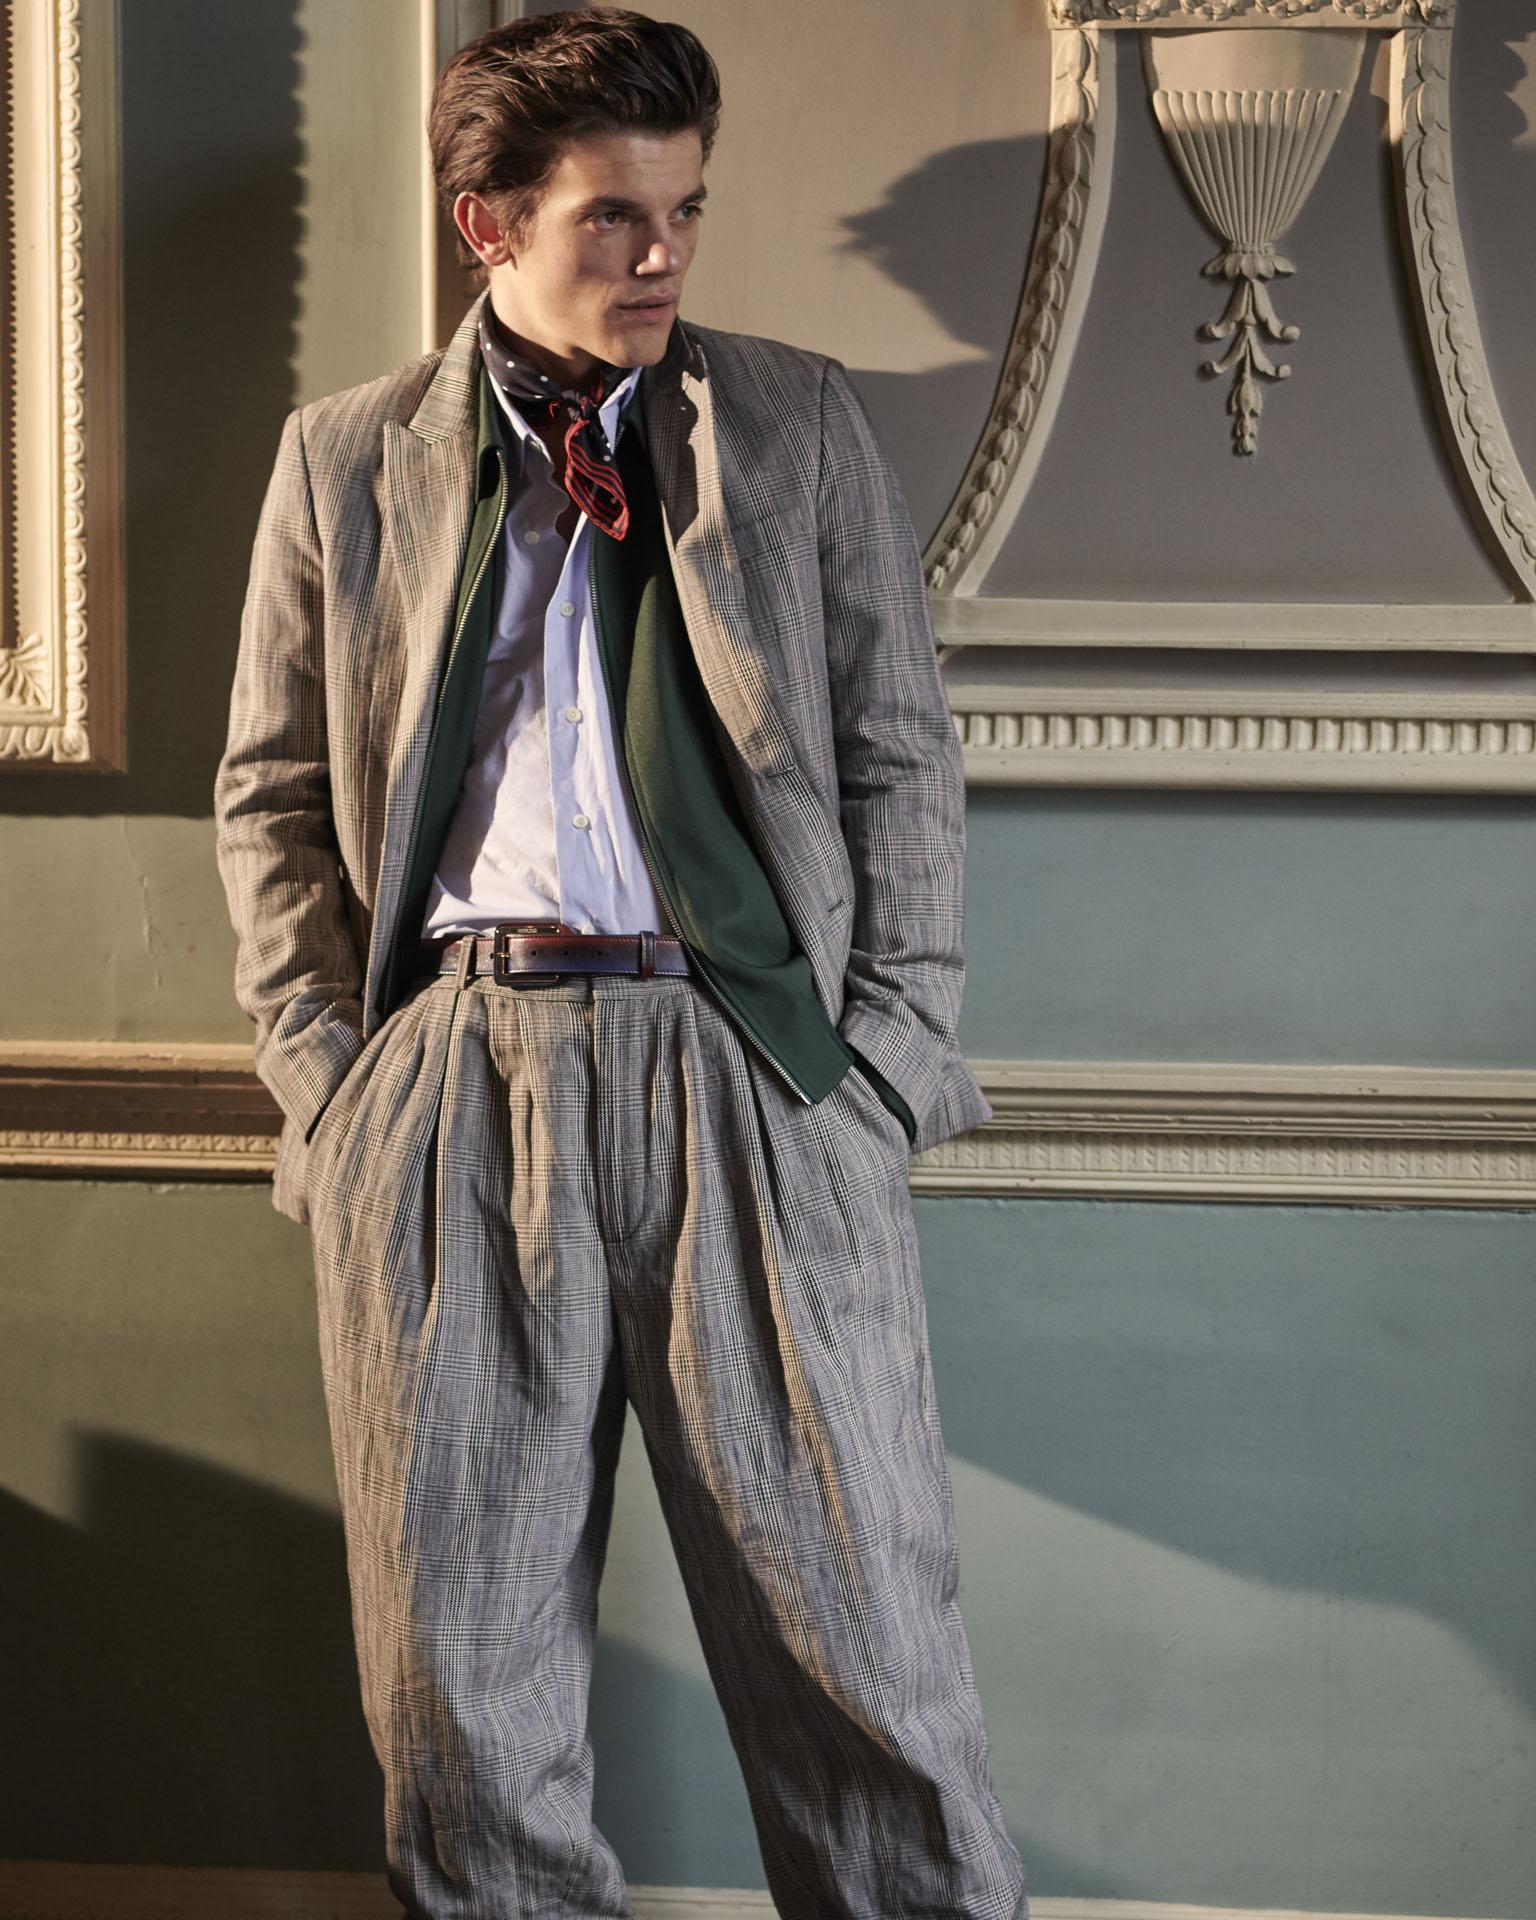 Suit JOSEPH, Jacket & Shirt KENT & CURWEN, Neckerchief BROOKS BROTHERS, Belt BERLUTI.